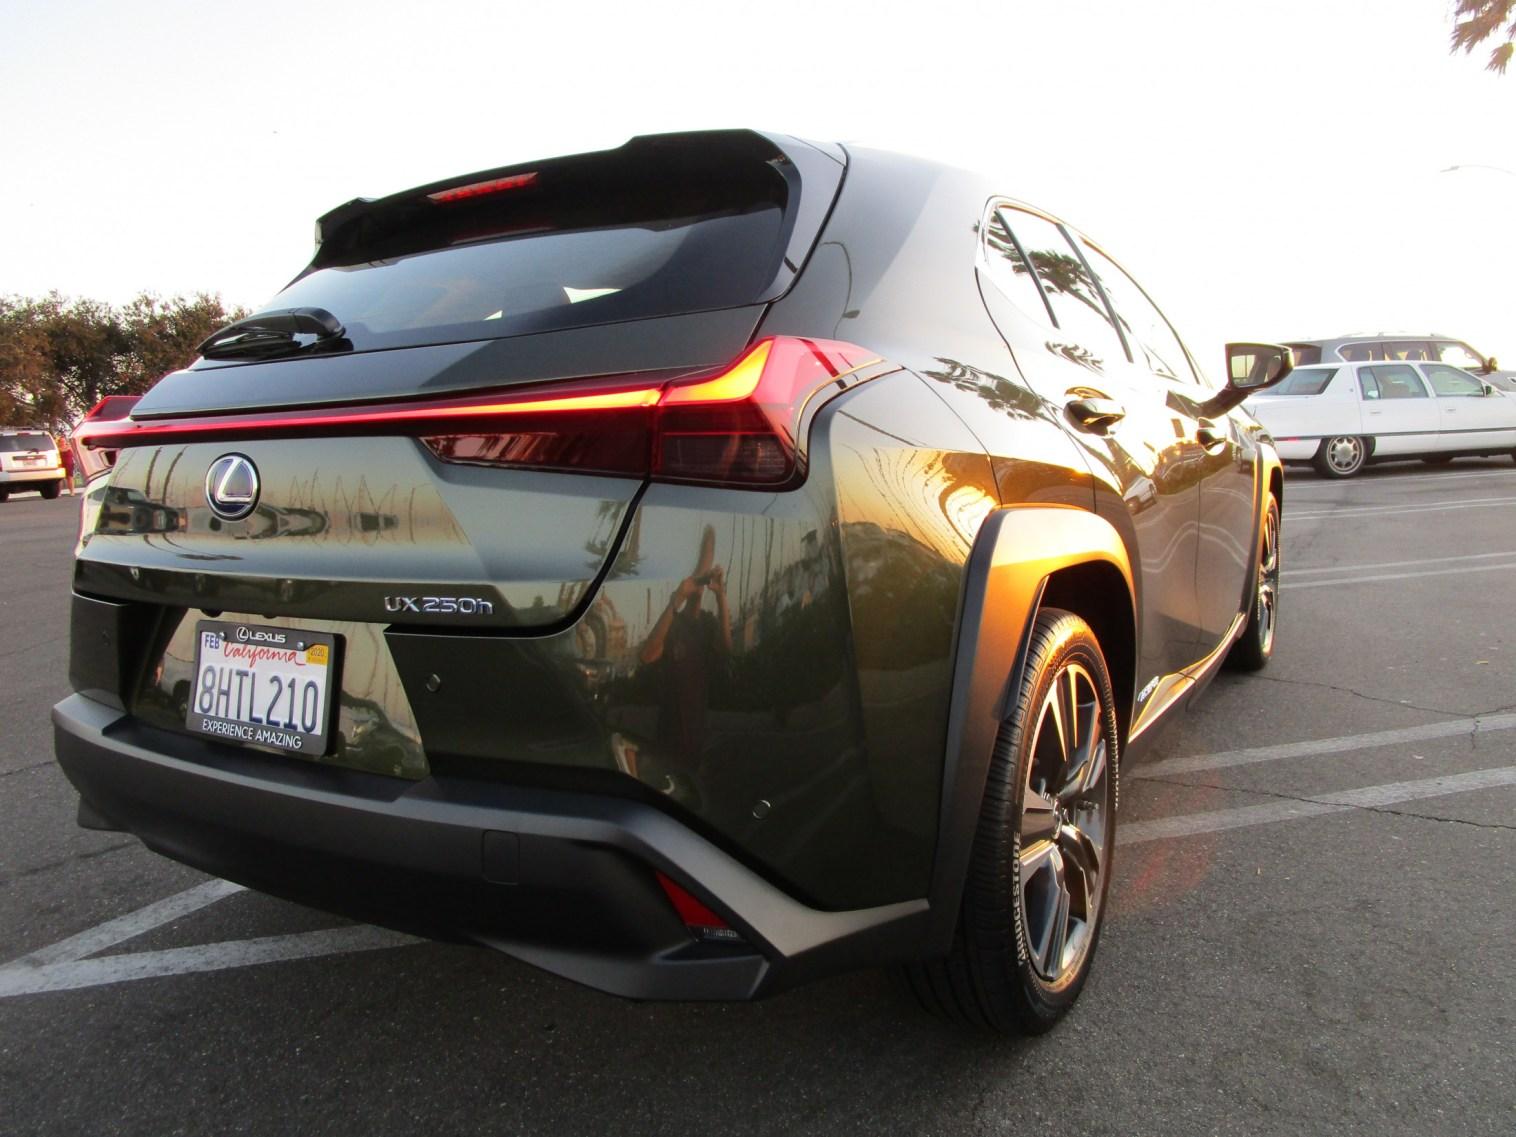 2019 Lexus UX 250h Hybrid (28)